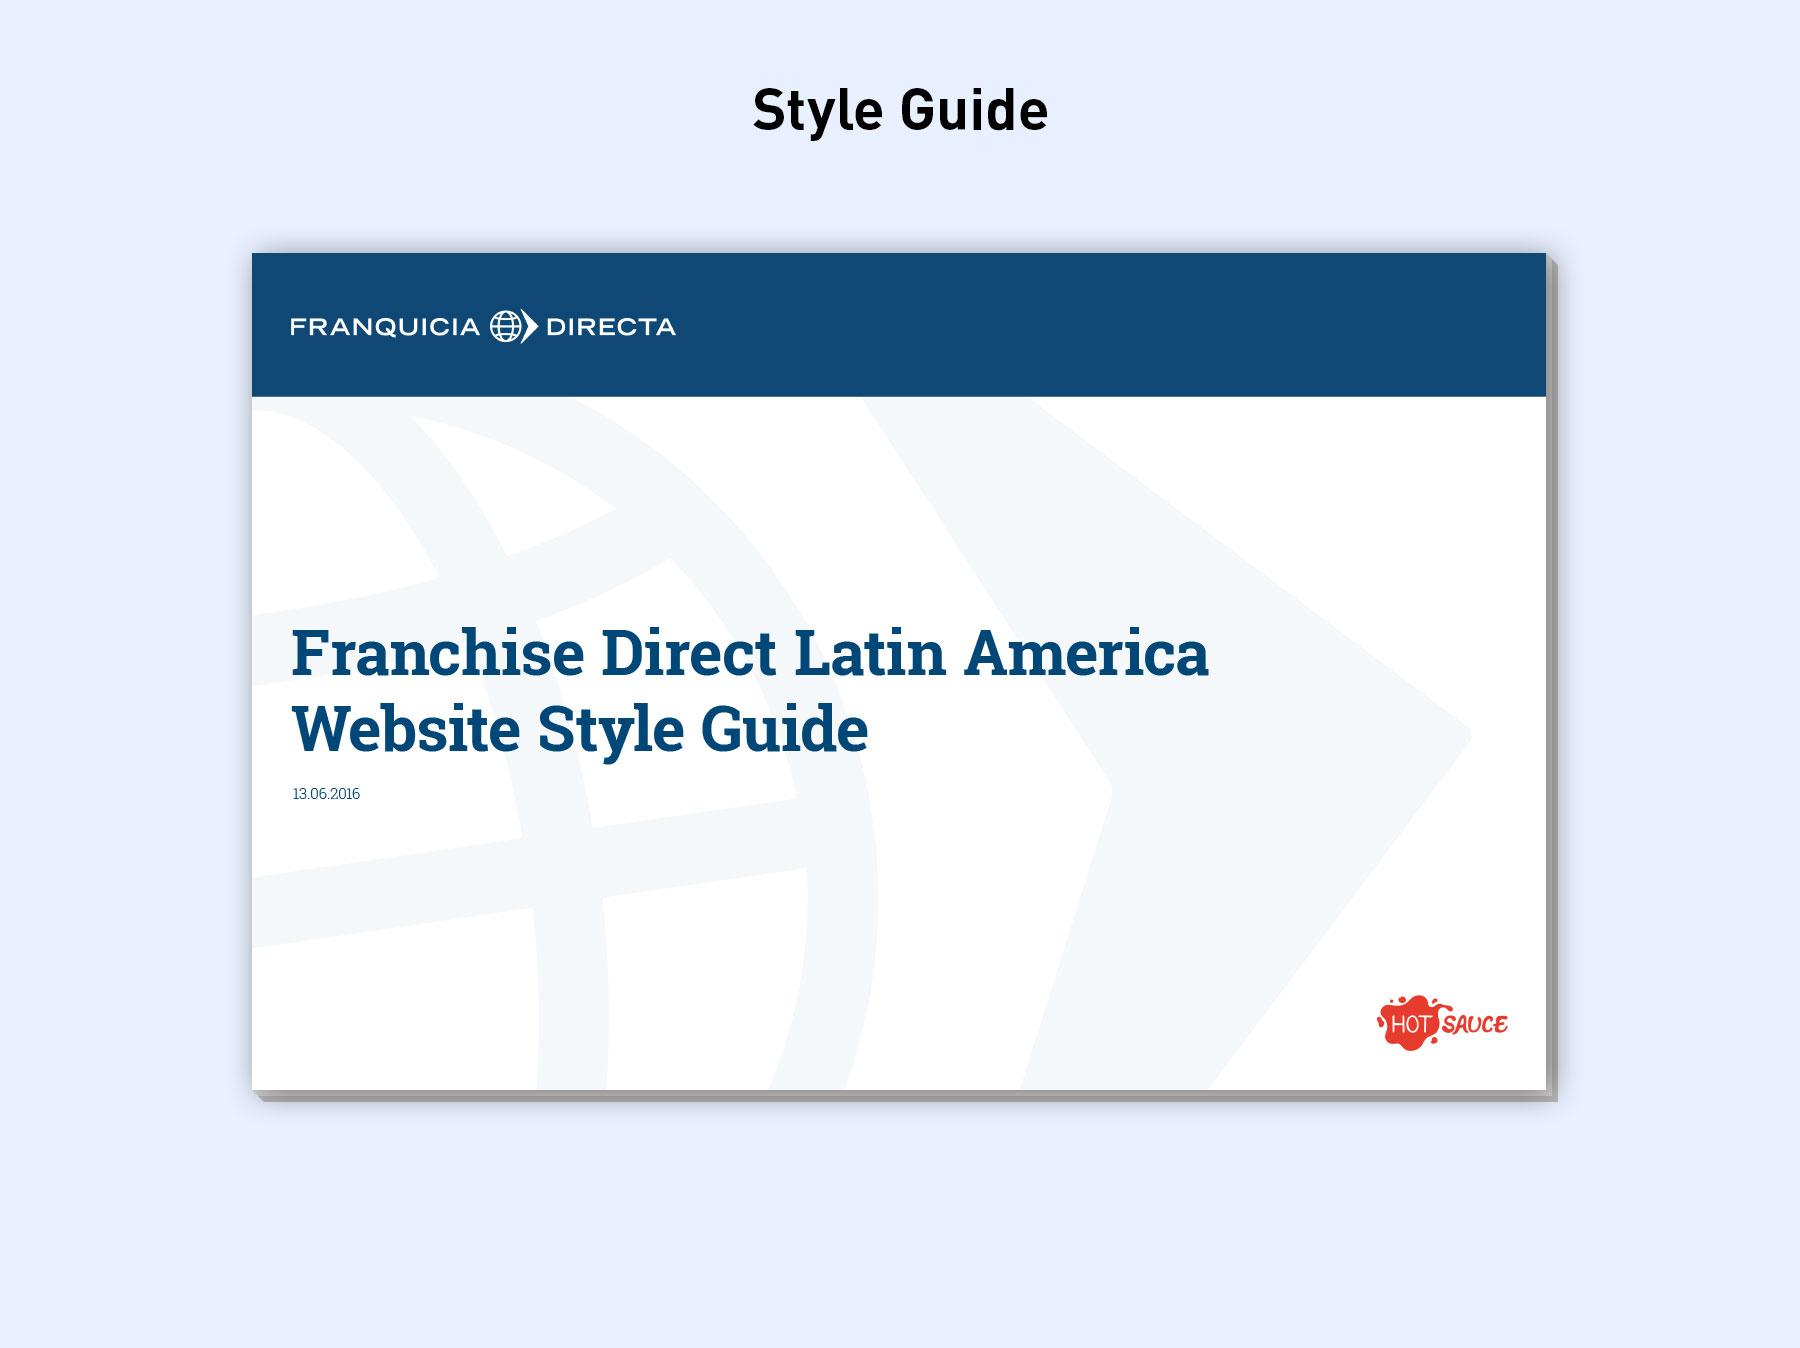 franchiseDirect_04.jpg